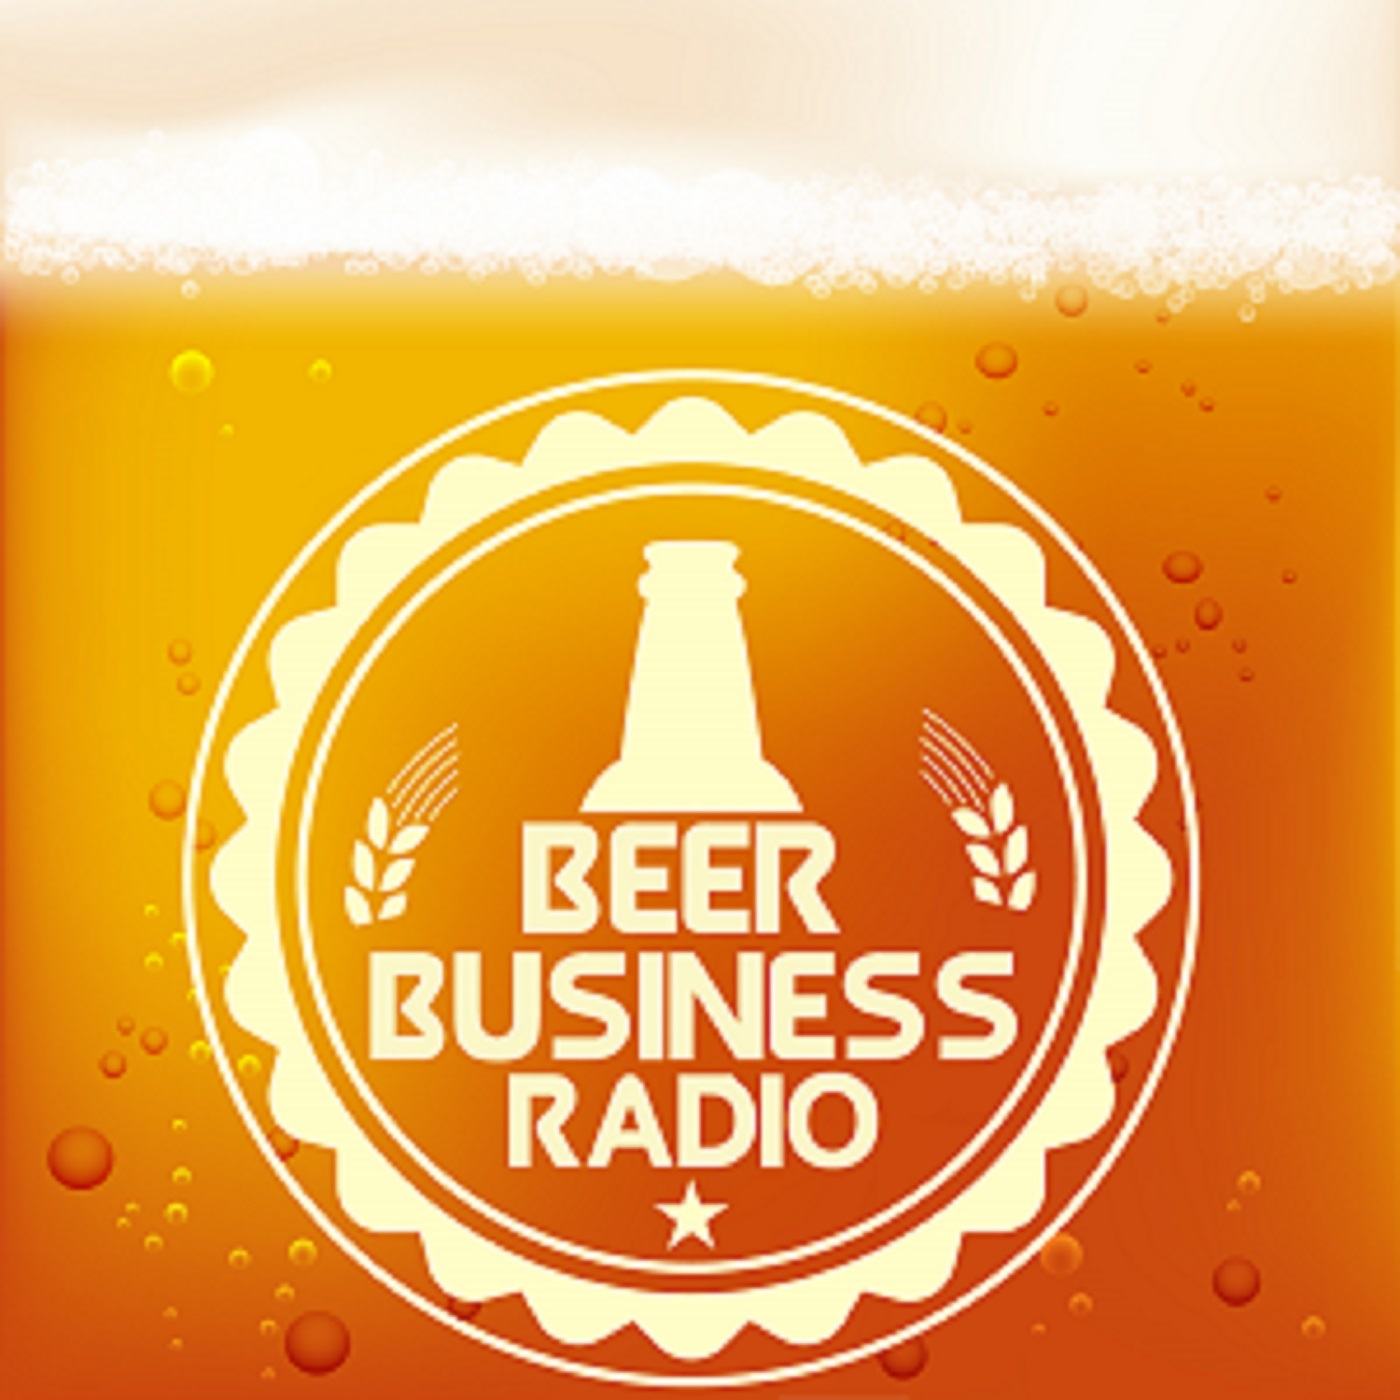 Beer Business Radio